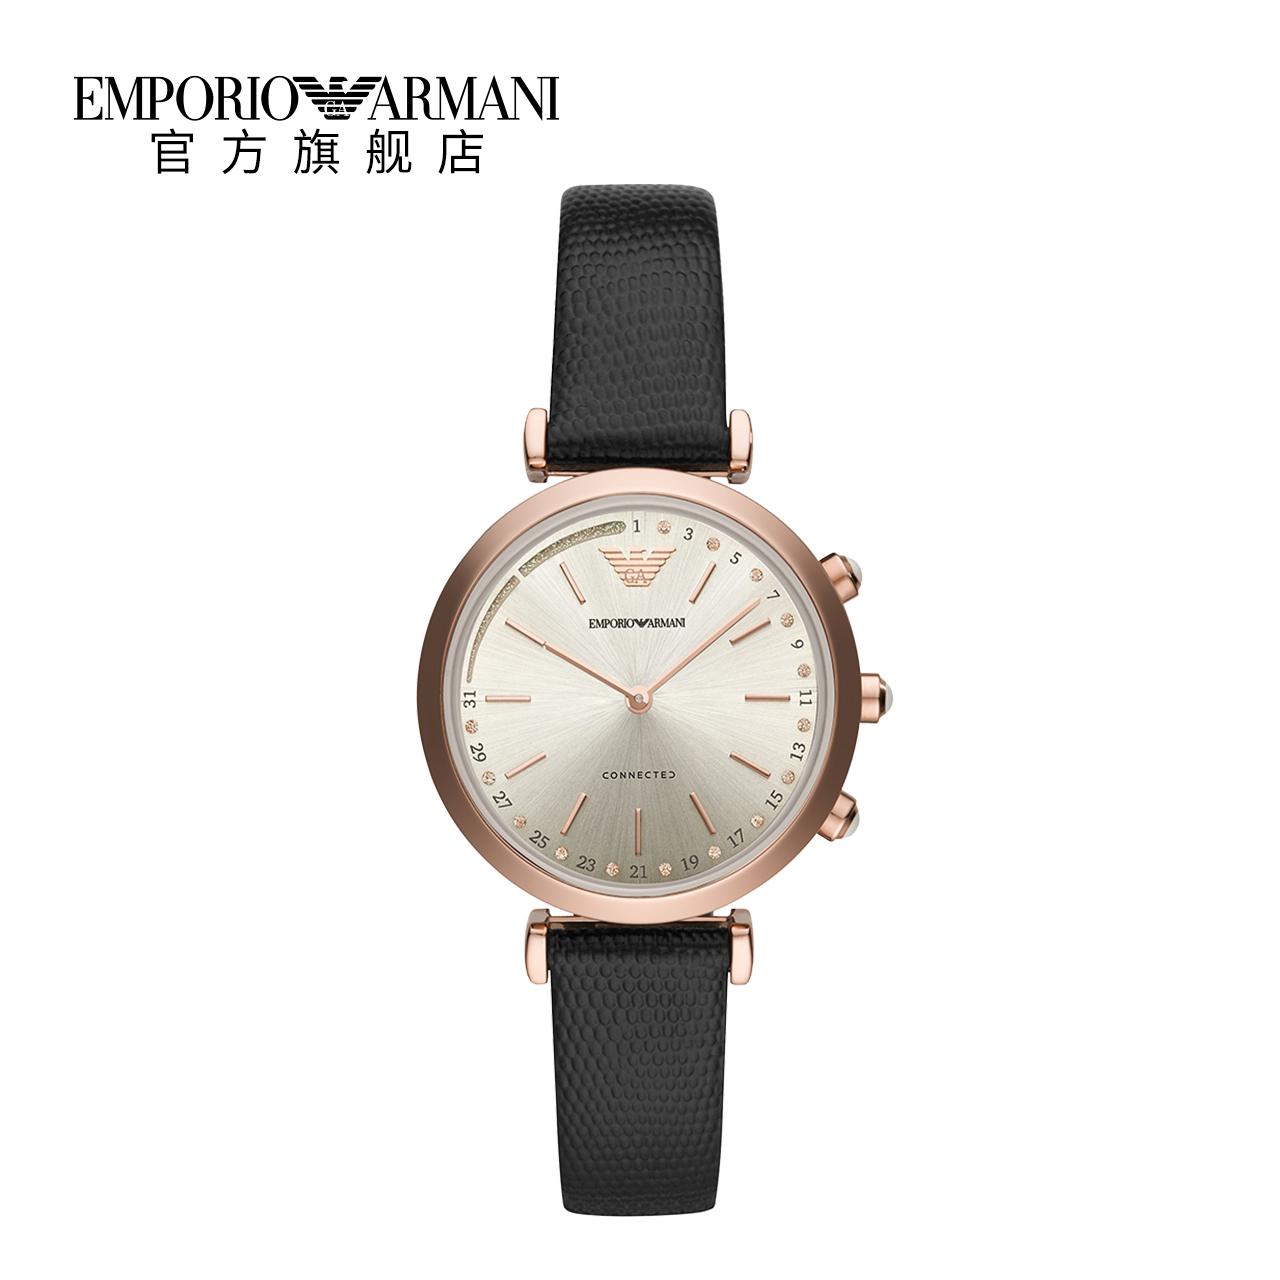 Armani阿玛尼官方正品新款镶钻电子手表女 时尚皮带智能表ART3027